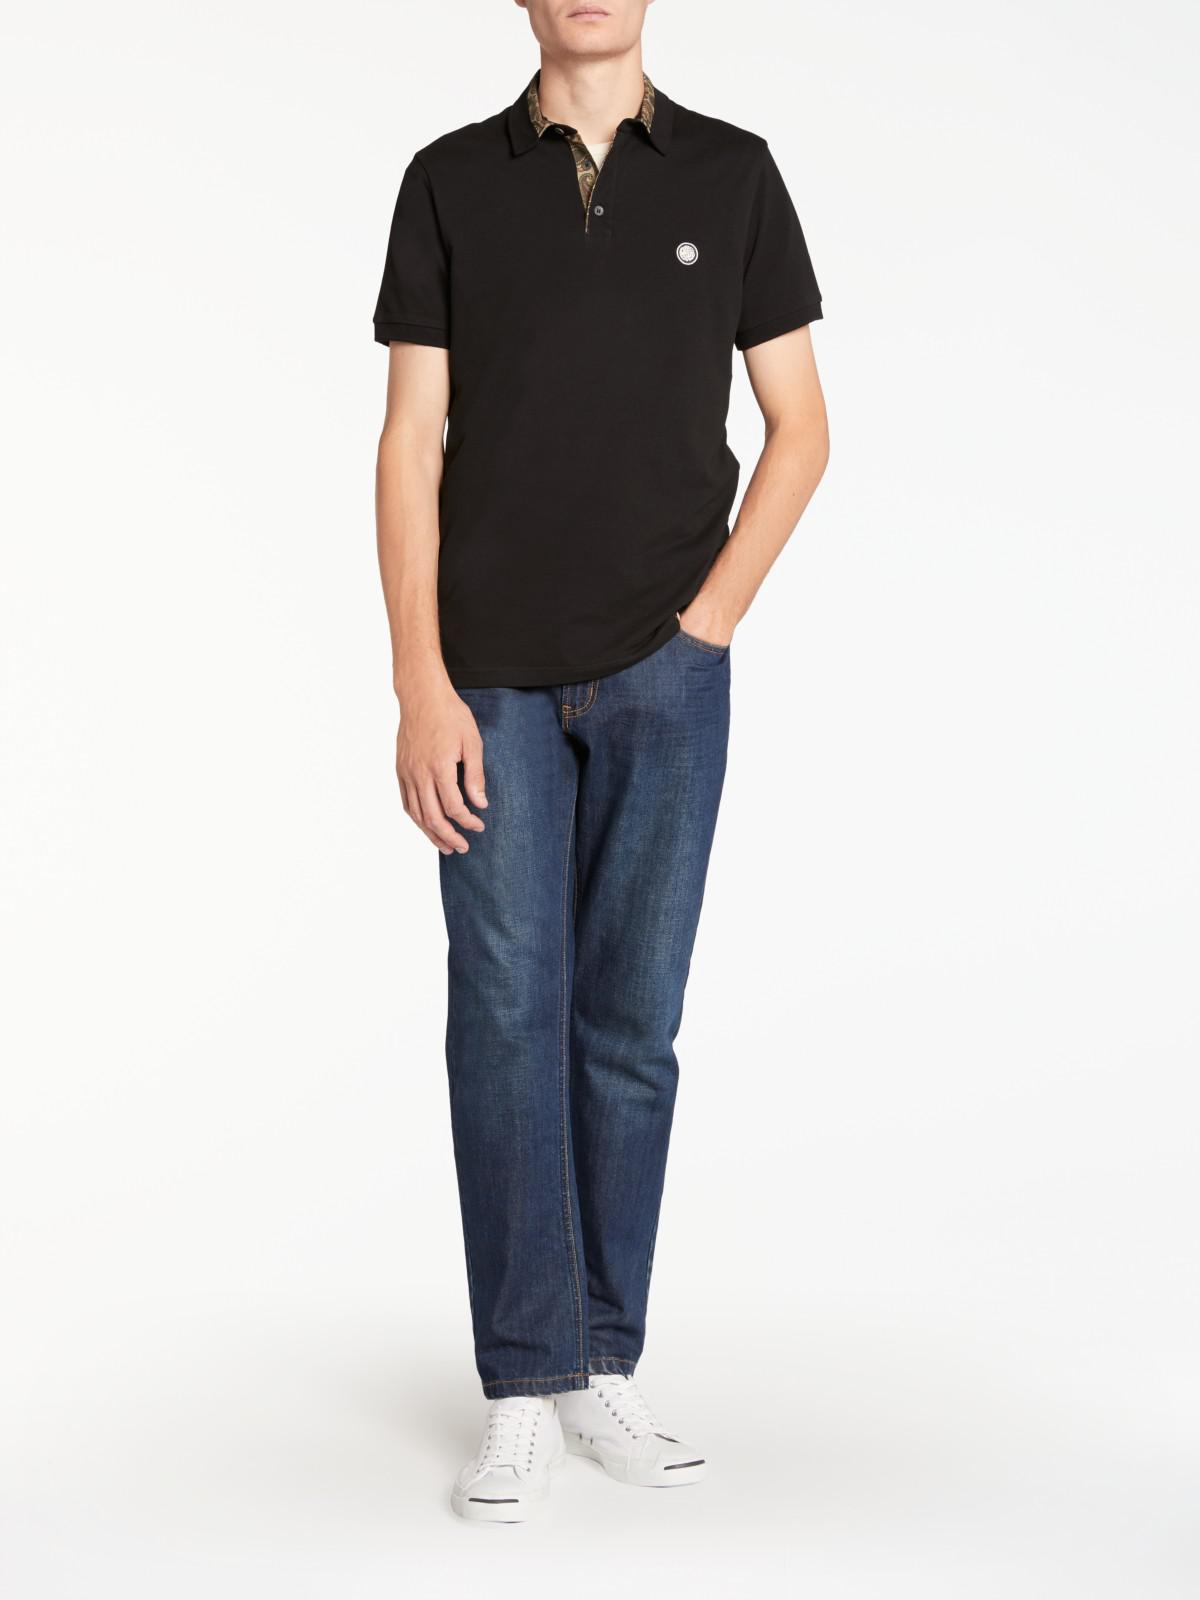 361d9ad61ce Pretty Green Black Polo Shirt - BCD Tofu House